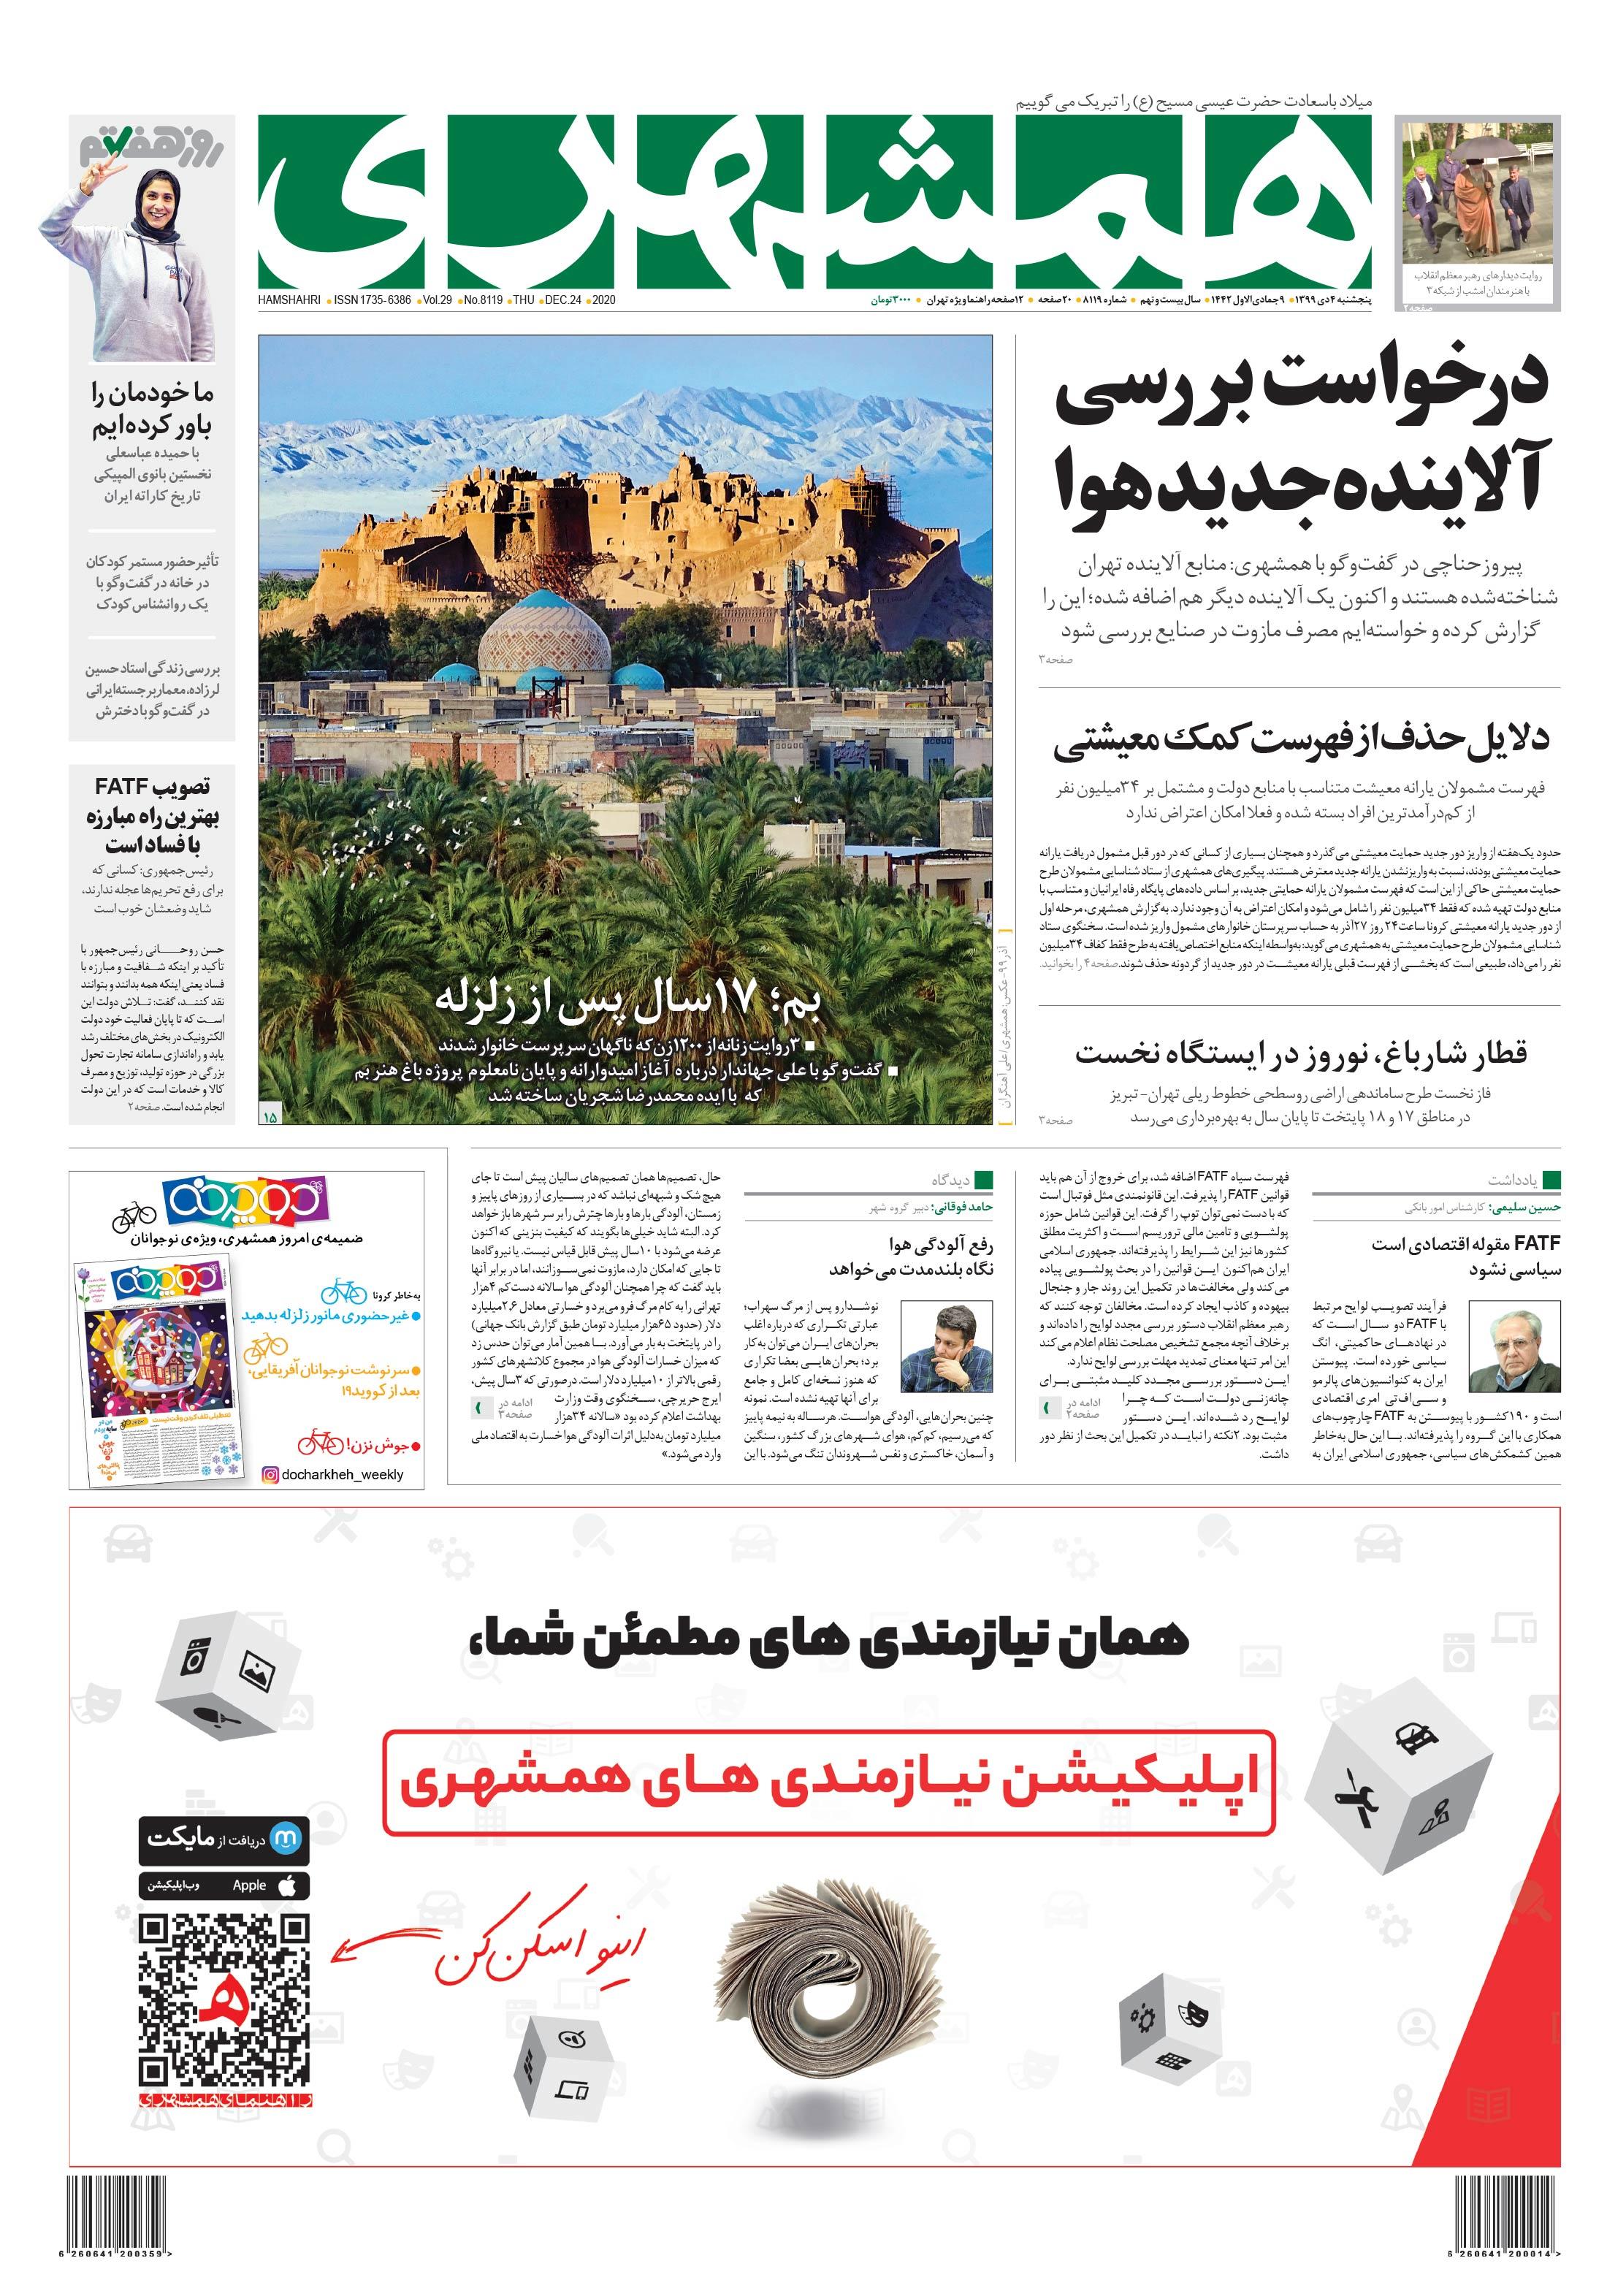 صفحه اول پنجشنبه 4 دی 1399